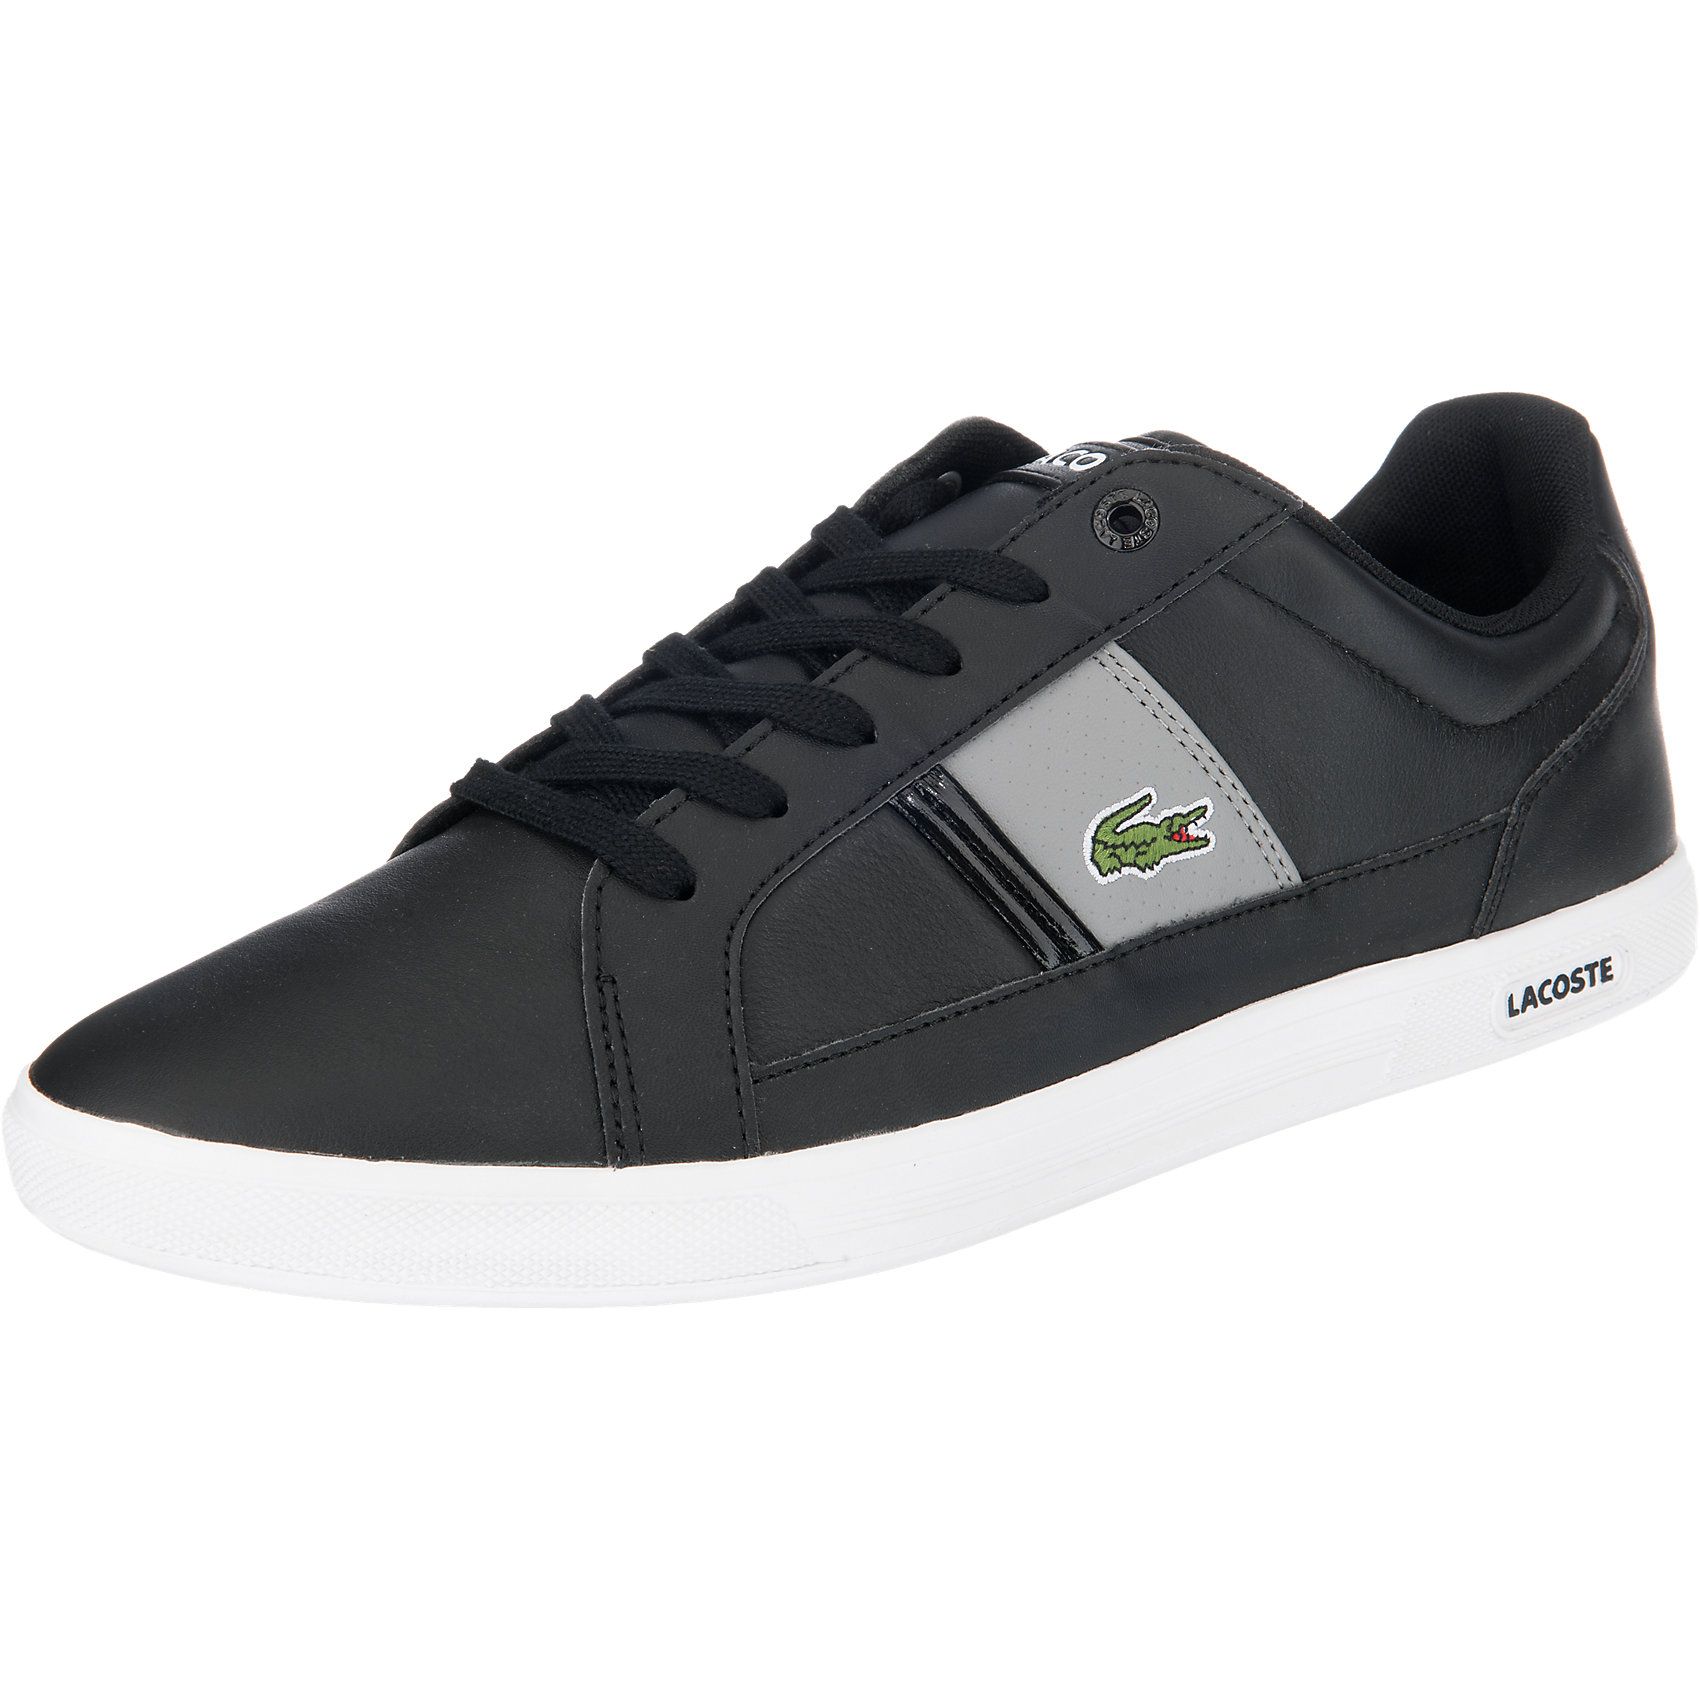 Neu schwarz LACOSTE Europa lcr3 Sneakers schwarz Neu 5754979 e83699